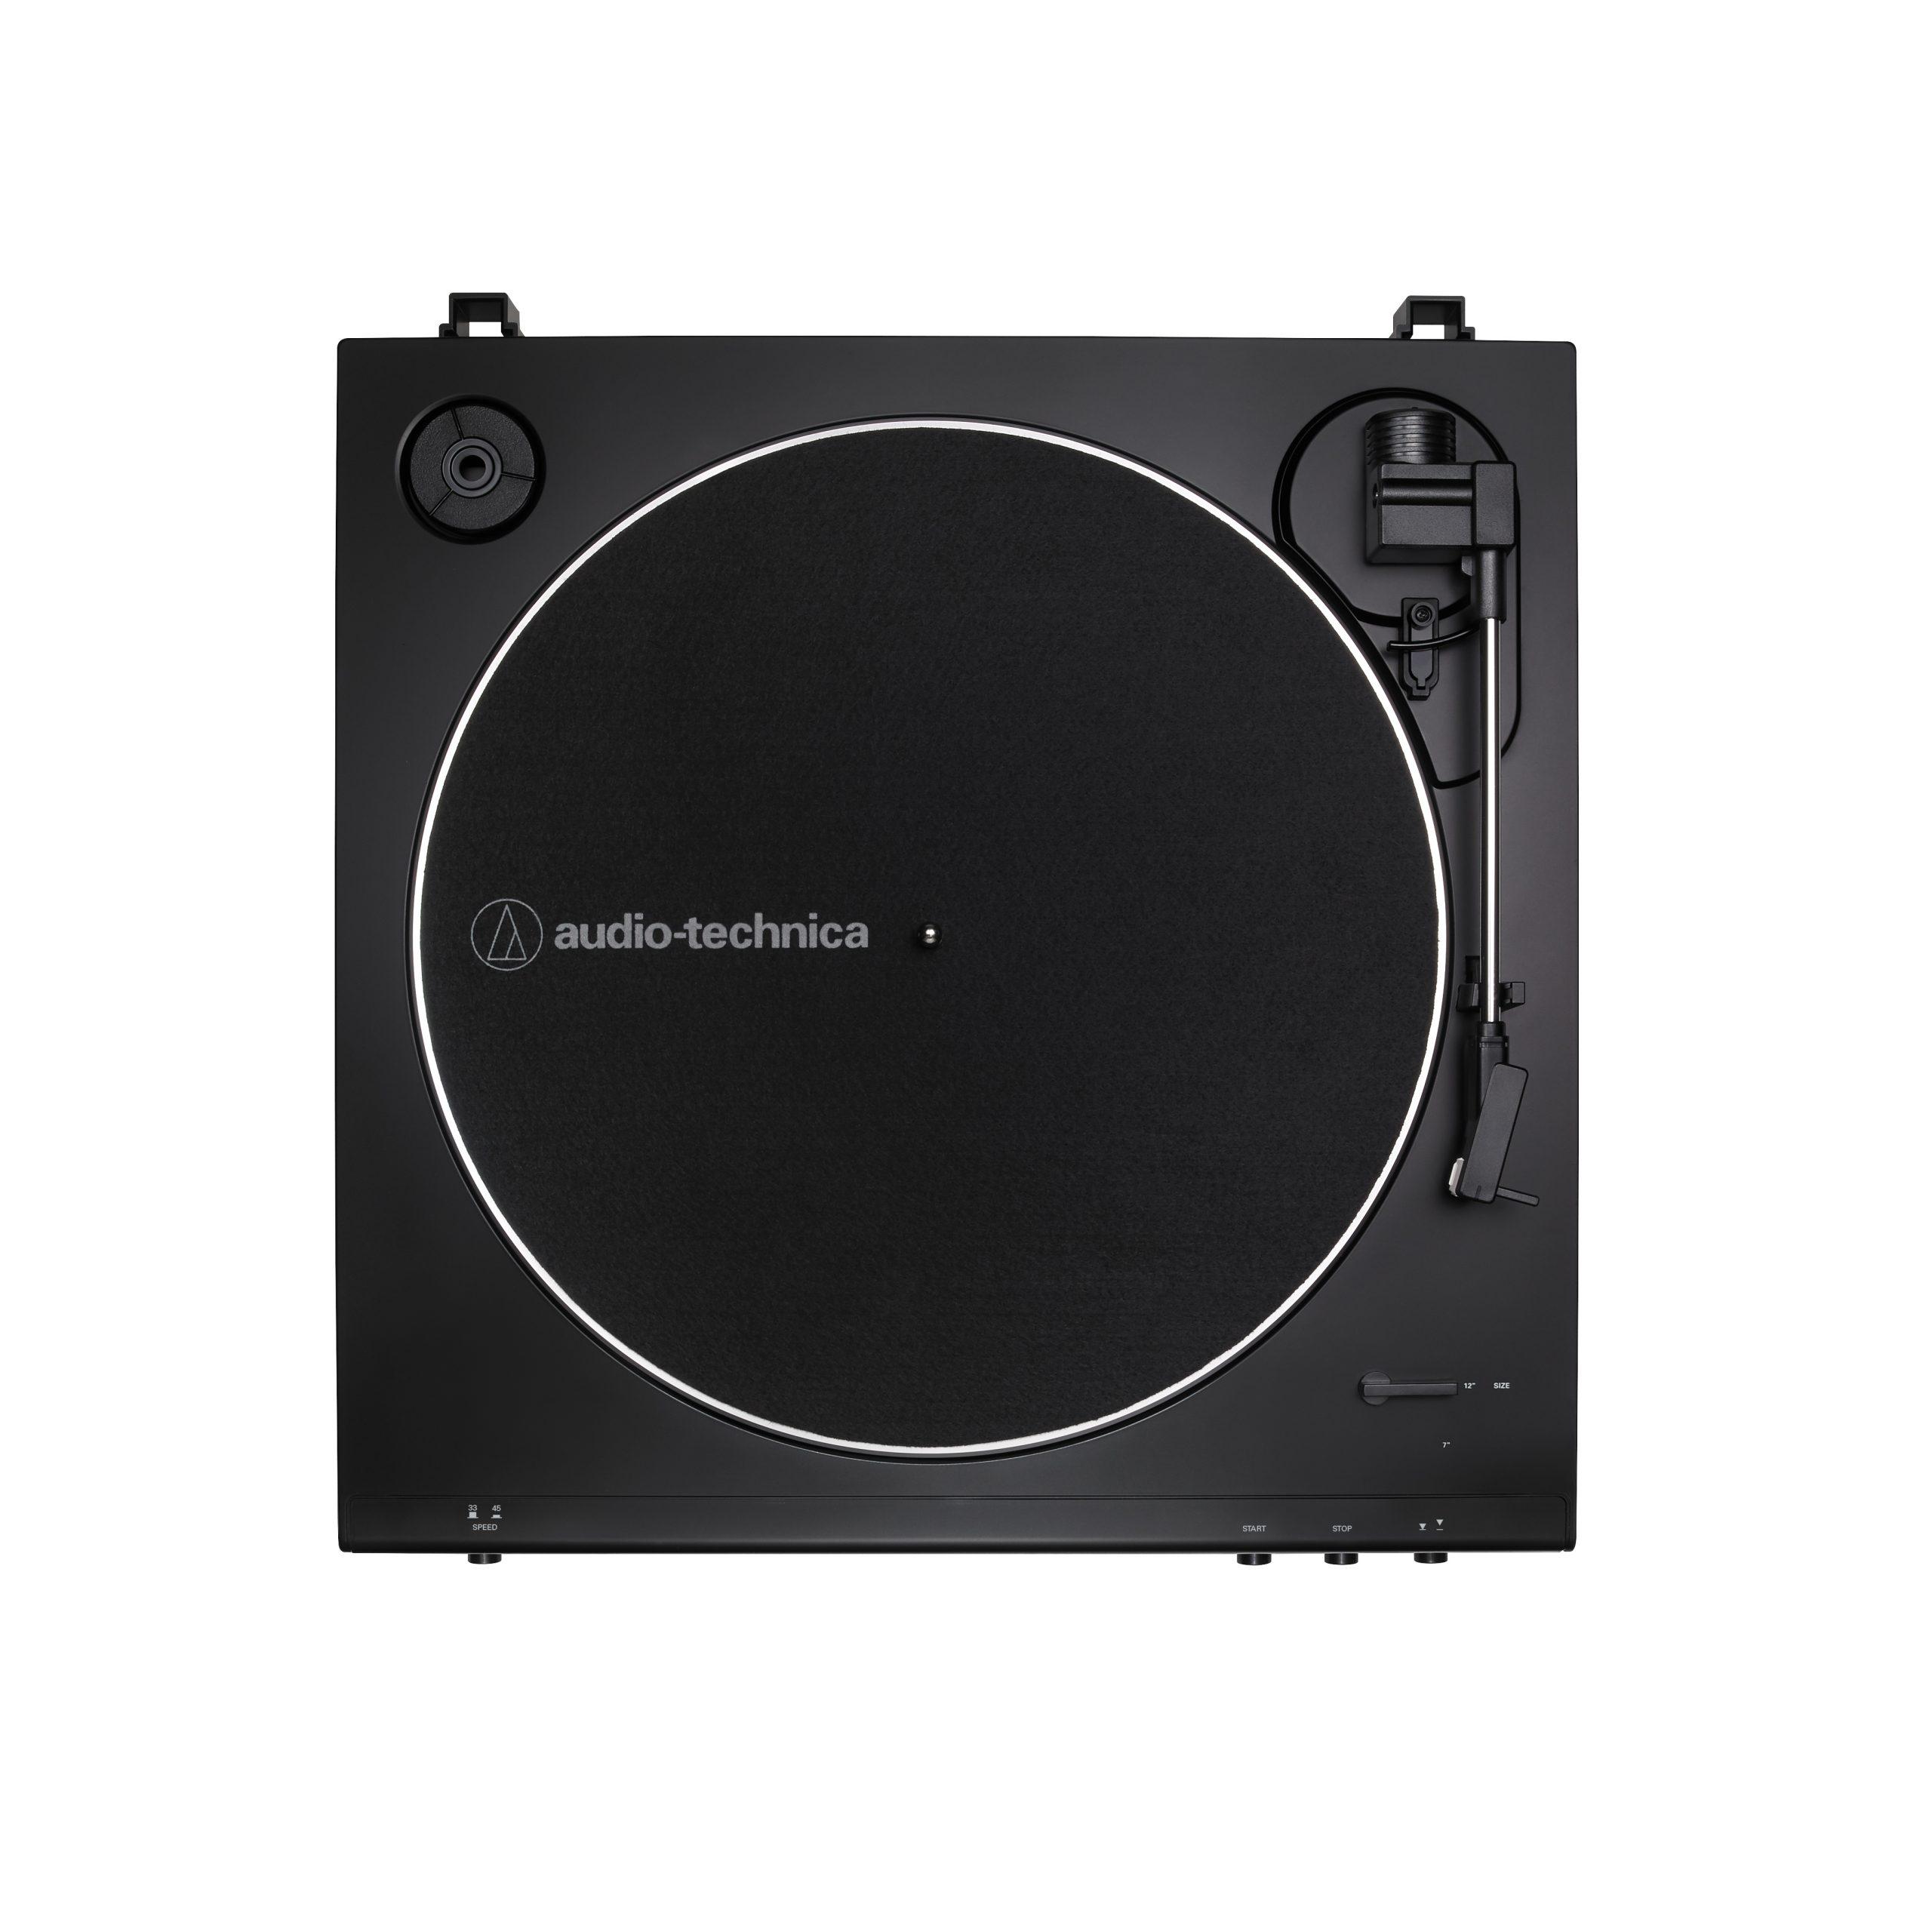 Turntable for sale, Audio Technica Sale, Vinyl player on sale